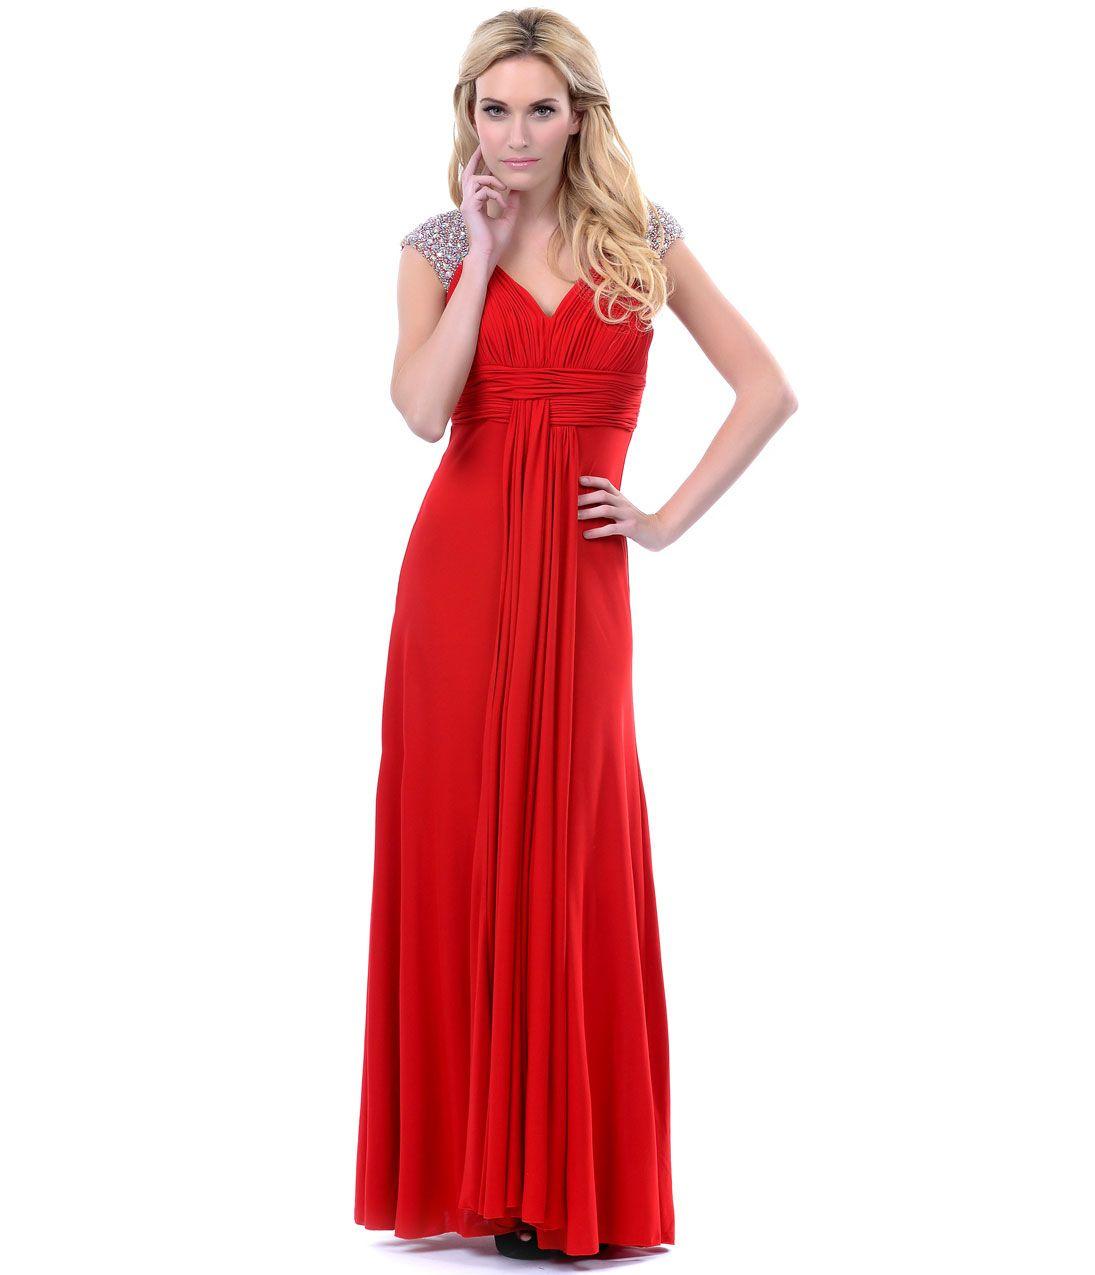 Red jersey knit rhinestone cap sleeve prom dress prom dresses